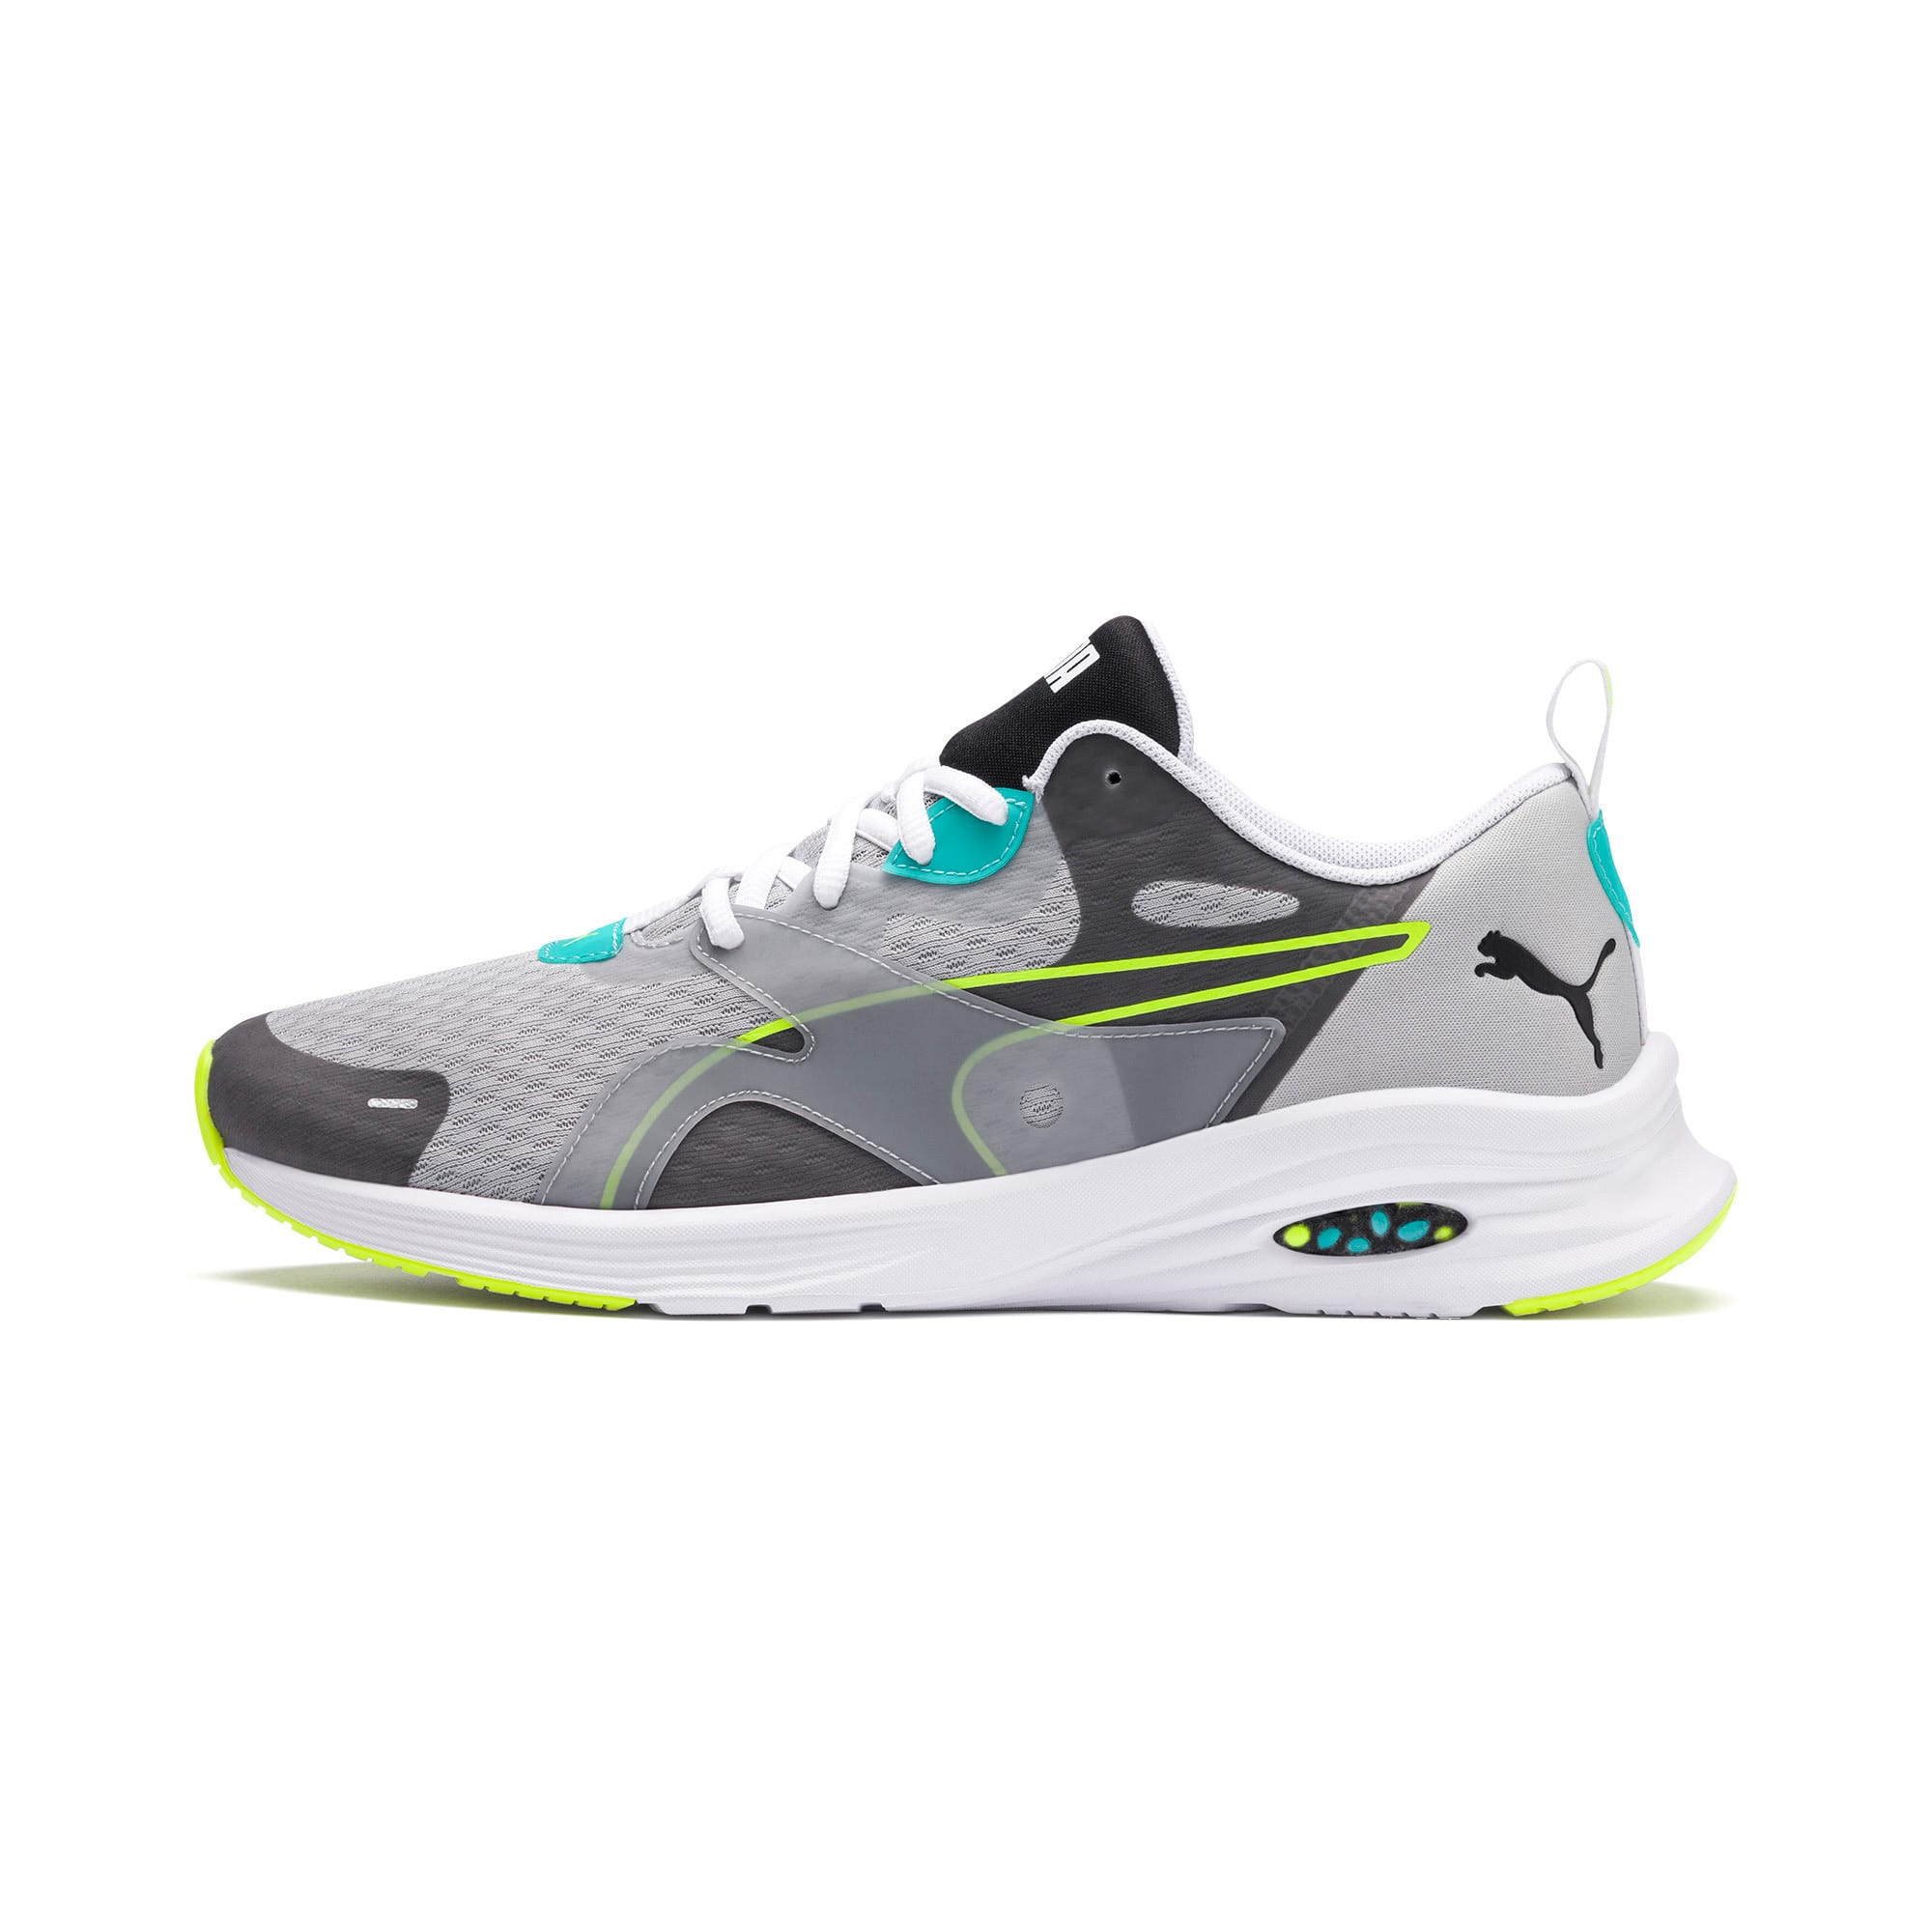 Miniatura 1 de Zapatos para correr HYBRID Fuego para hombre, High Rise-Blue Turquoise, mediano